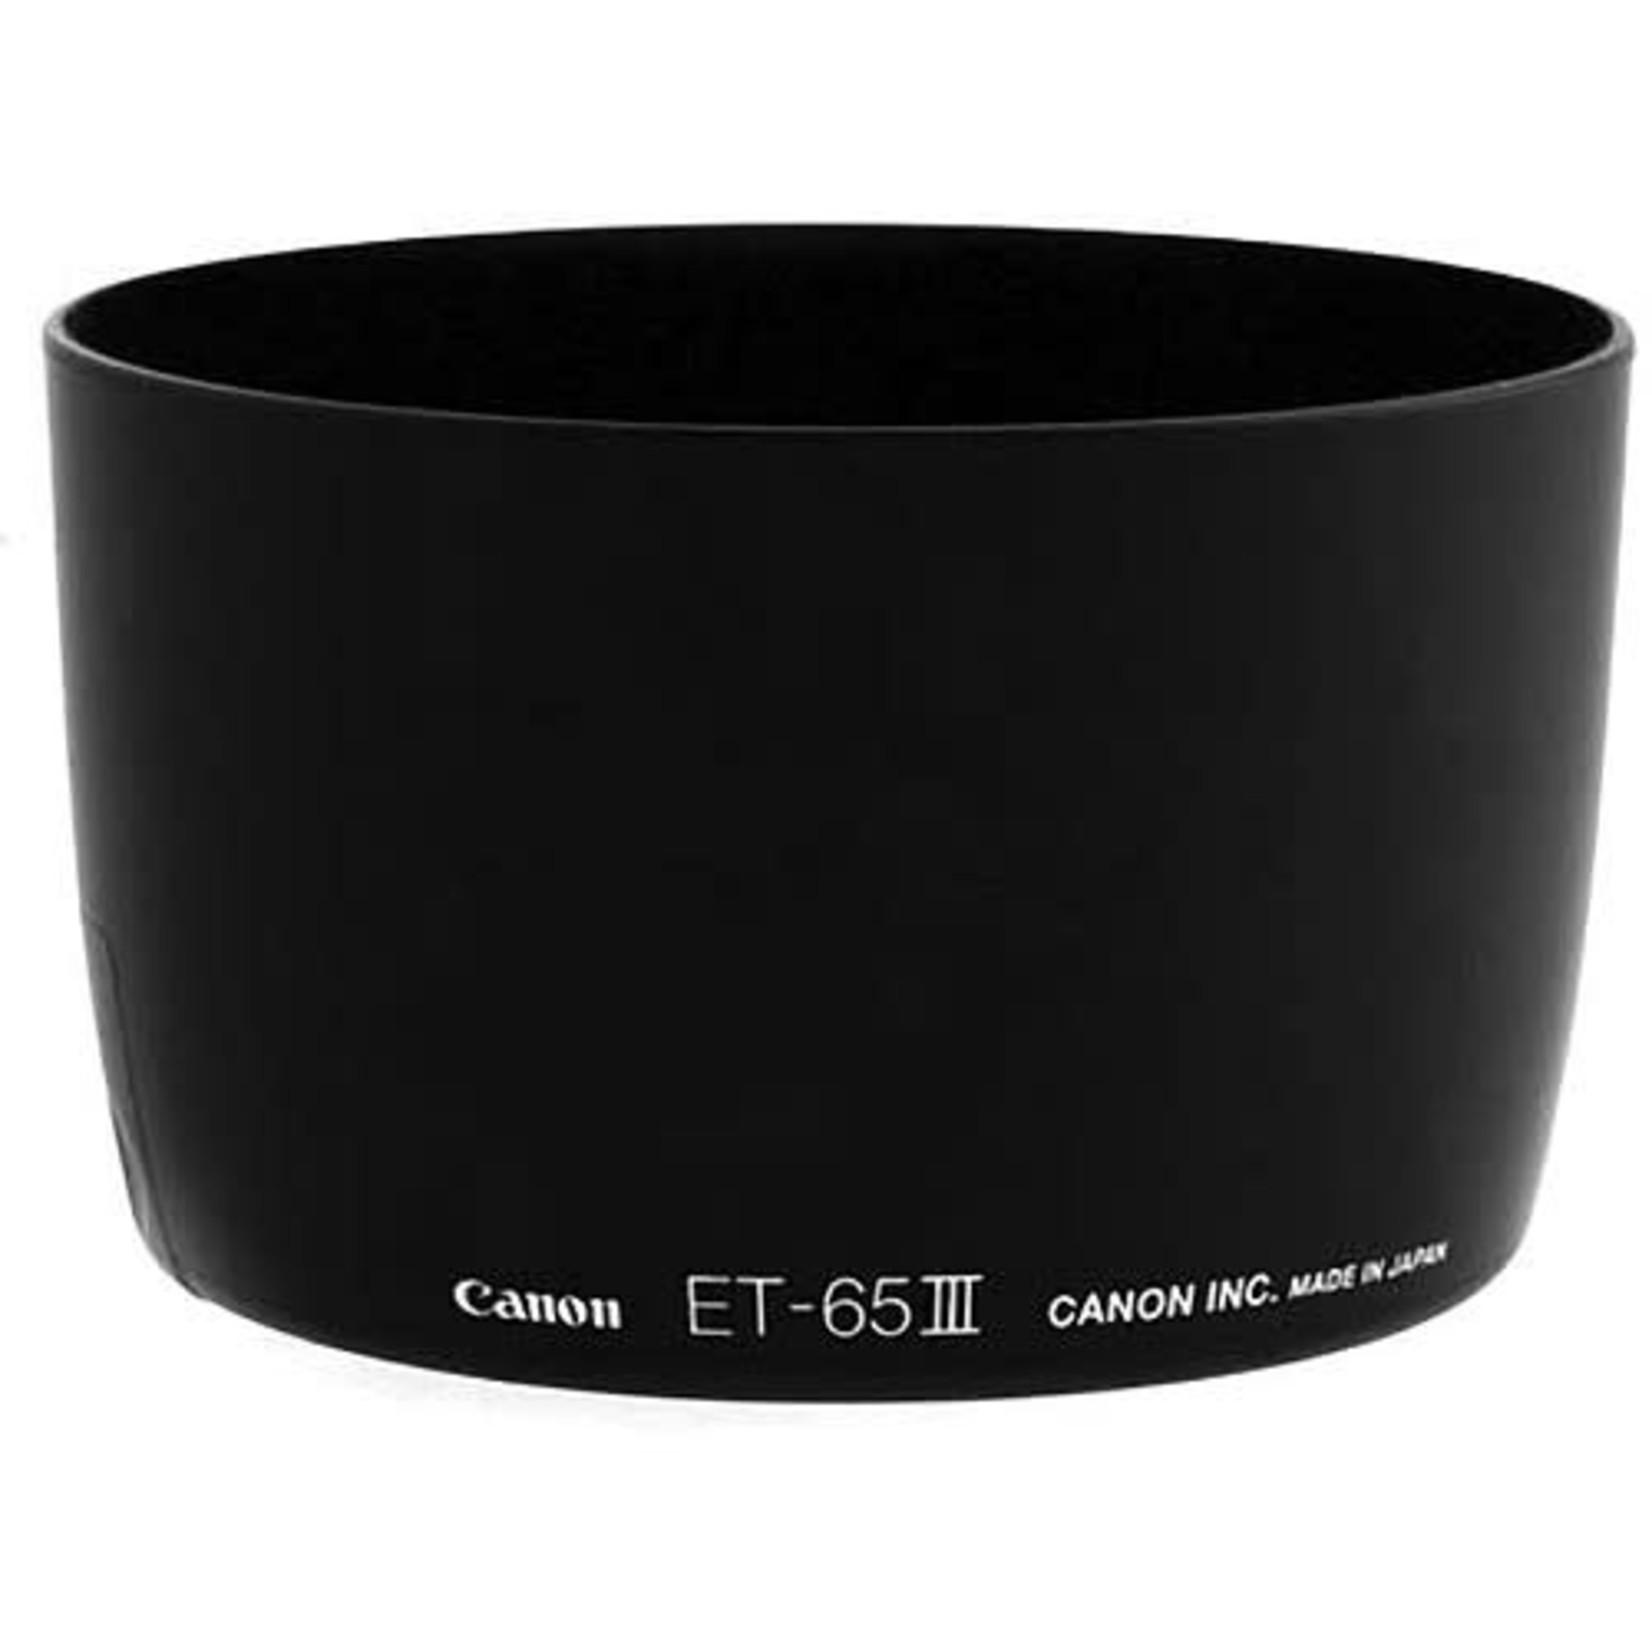 Canon Canon ET-65III Lens Hood for EF 85mm f/1.8, 100mm f/2.0, 135mm f/2.8 SF & 100-300mm f/4.5-5.6 Lenses